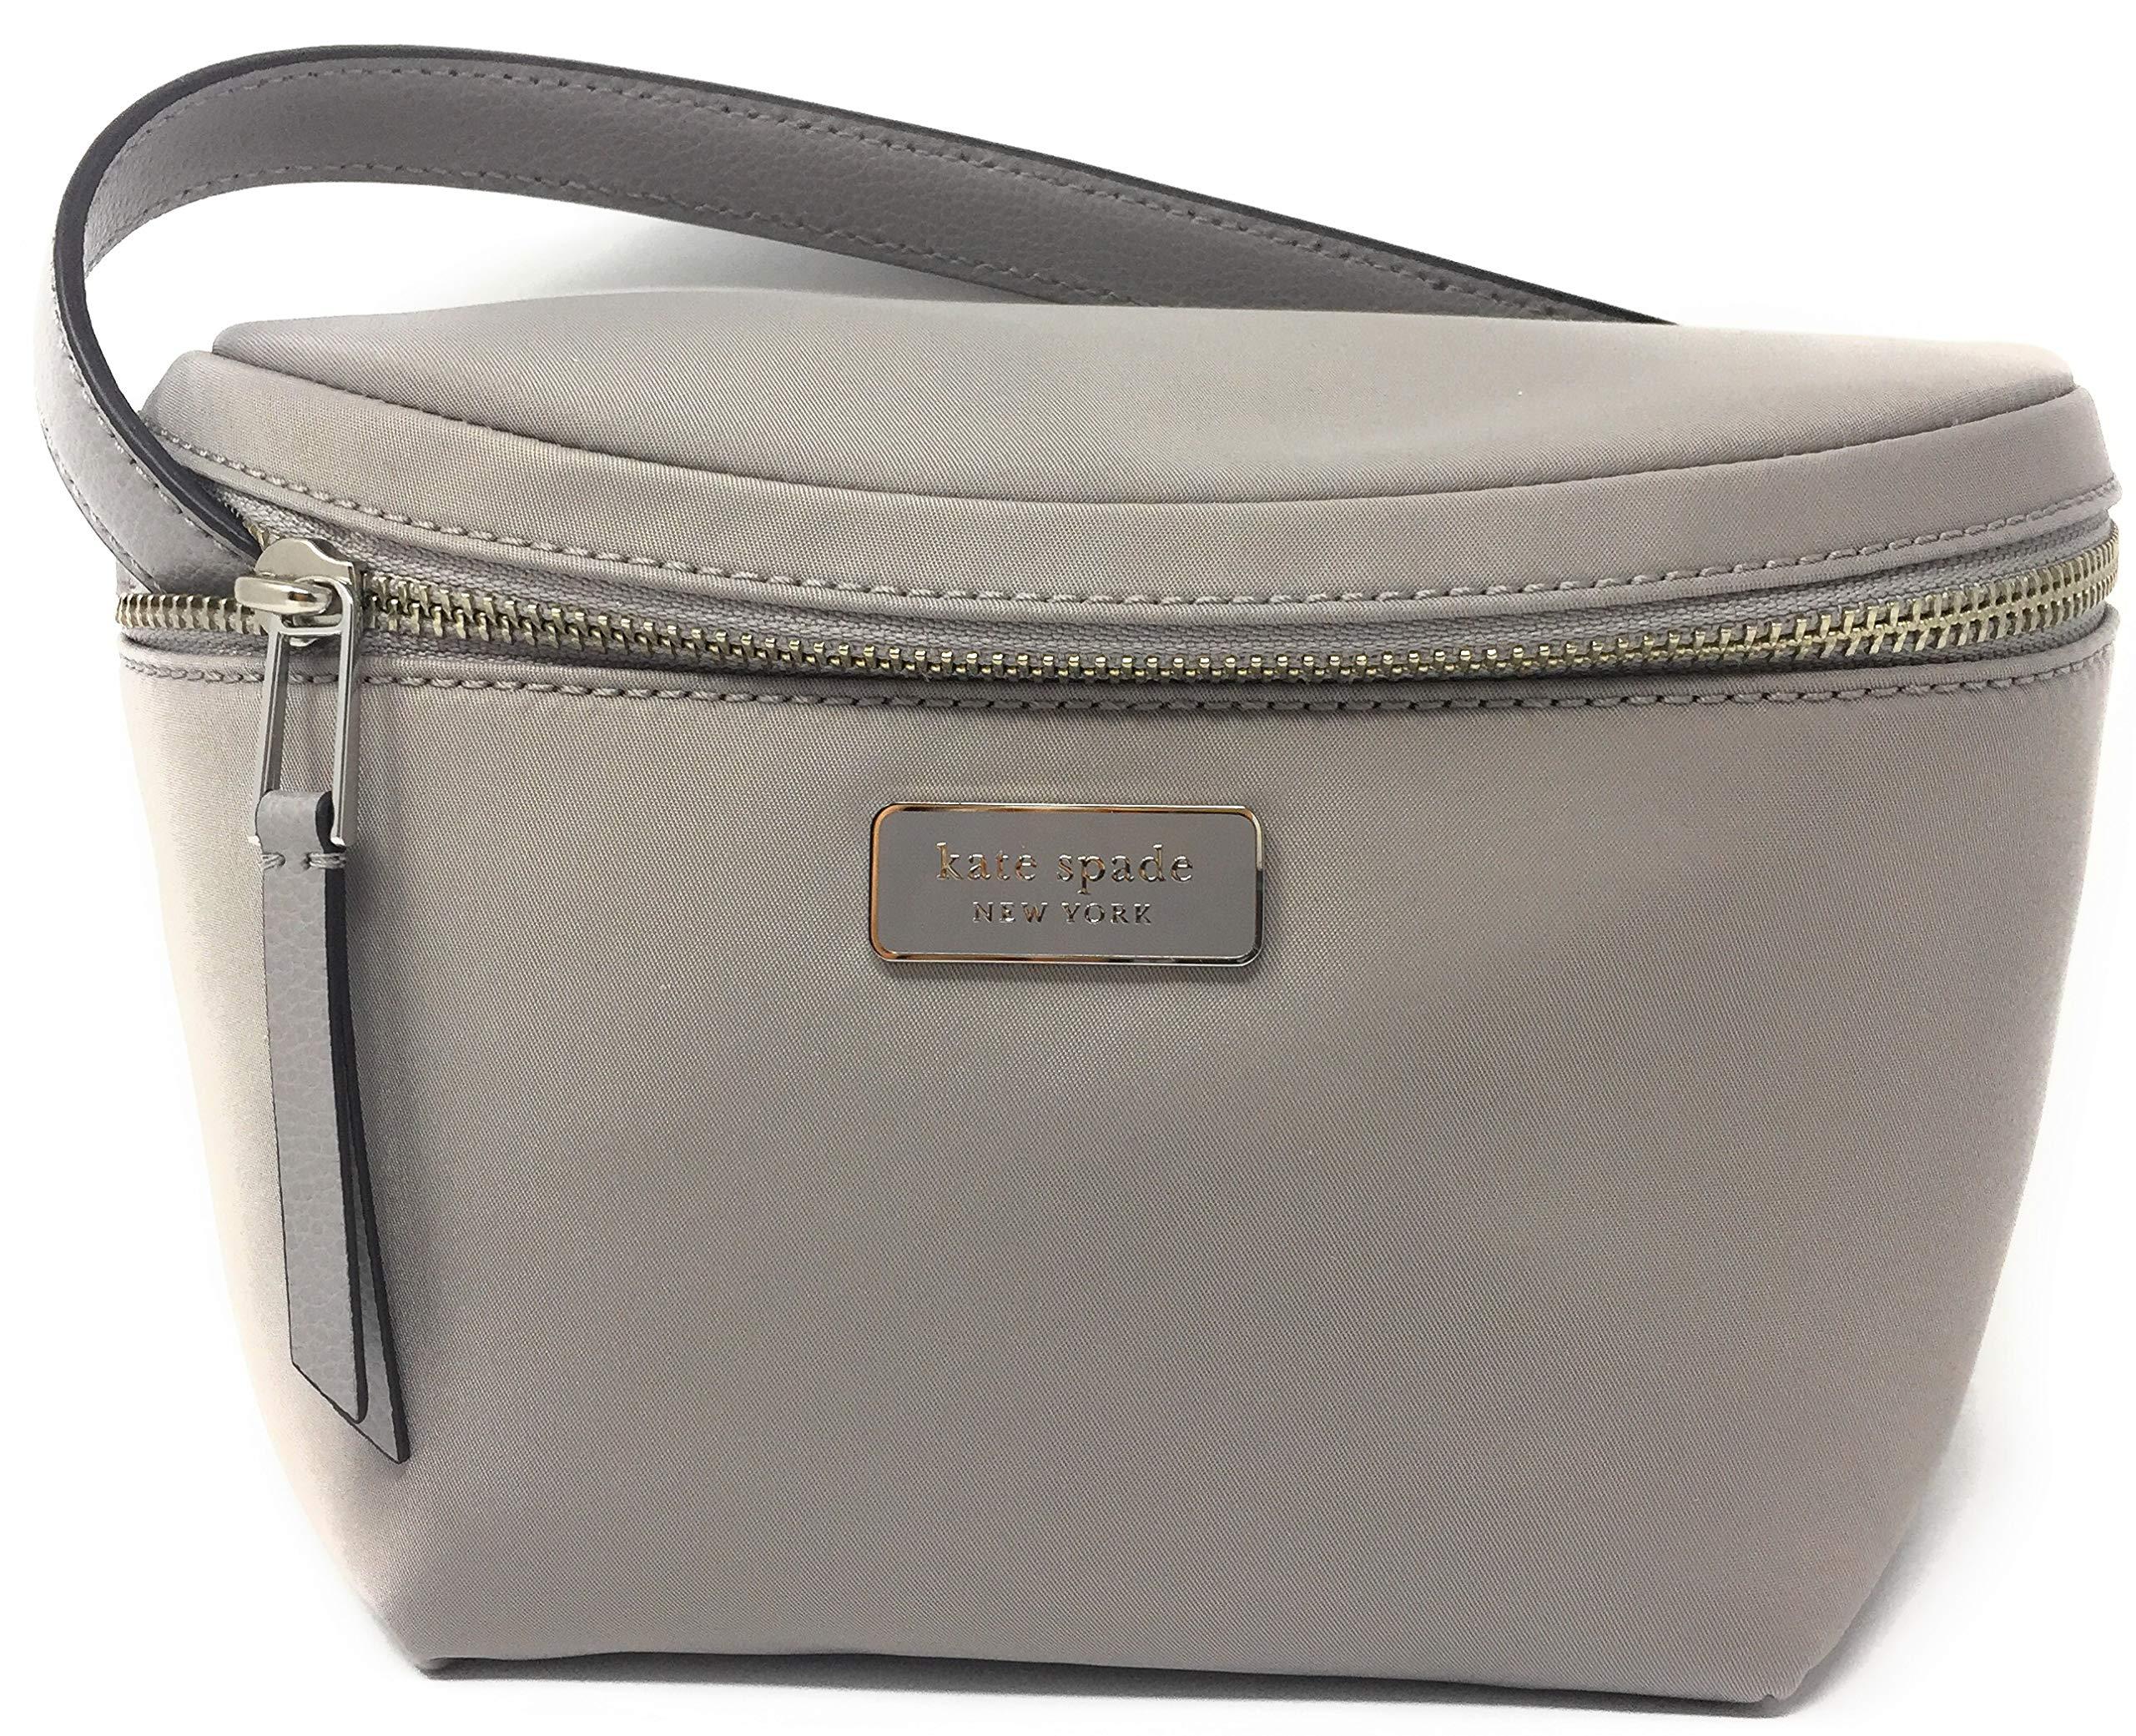 Kate Spade New York Dawn Belt Bag - Soft Taupe